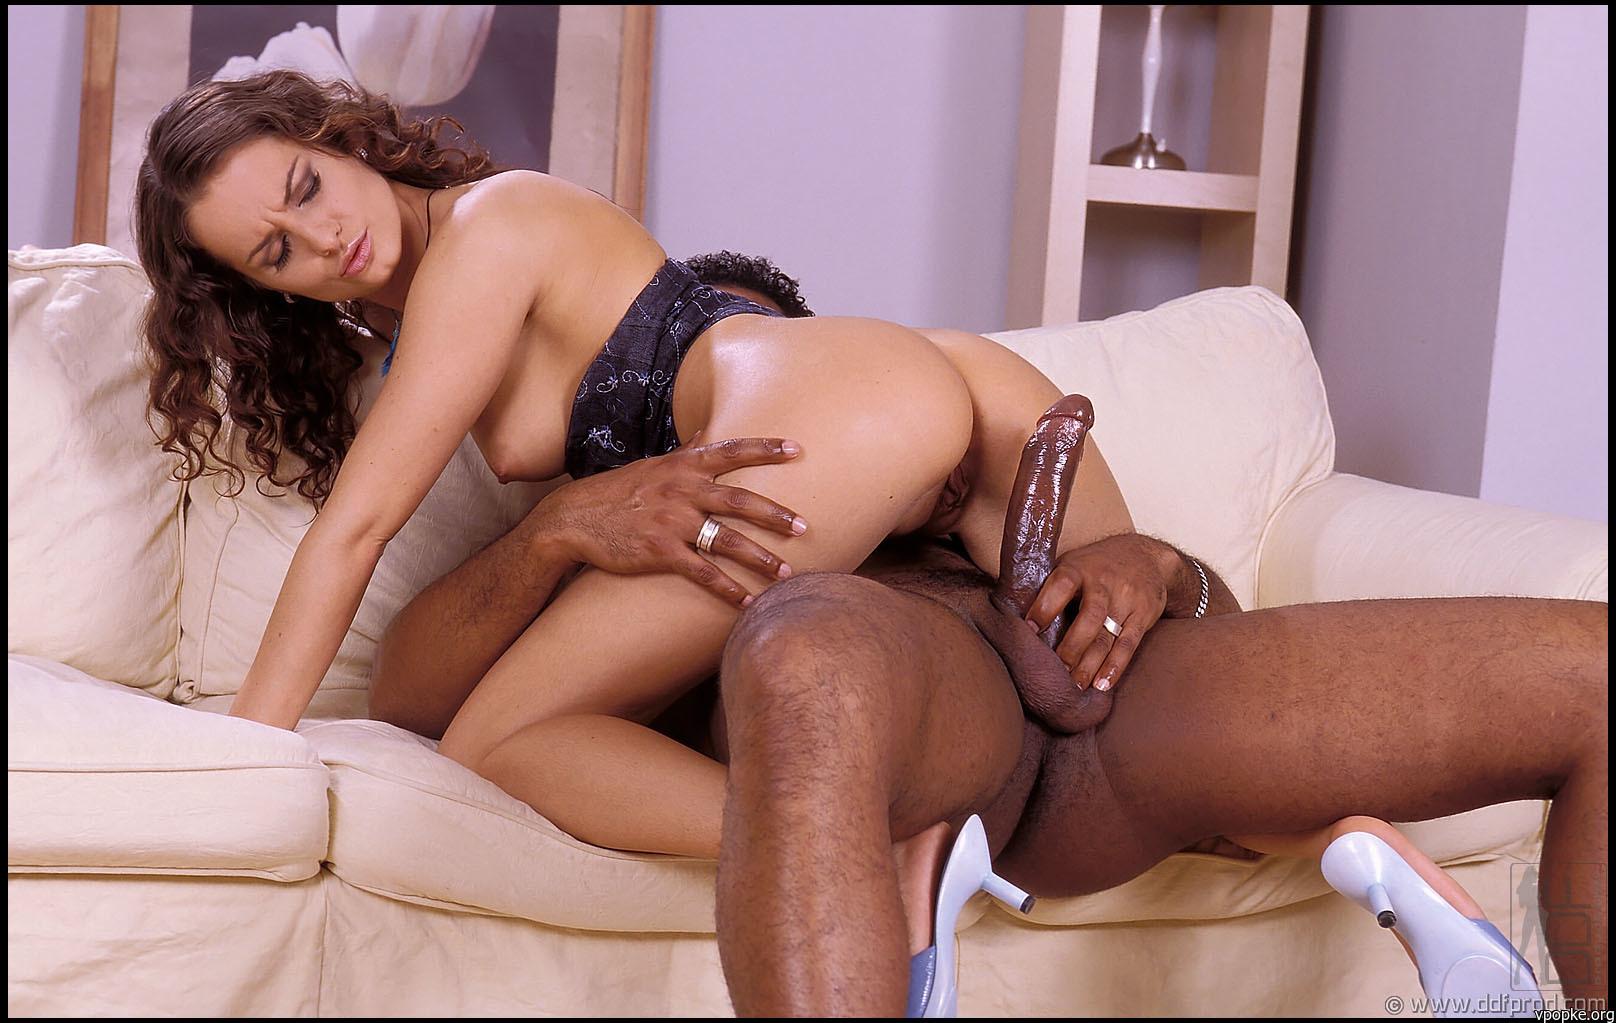 Групповое порно даниелы раш фото 540-879